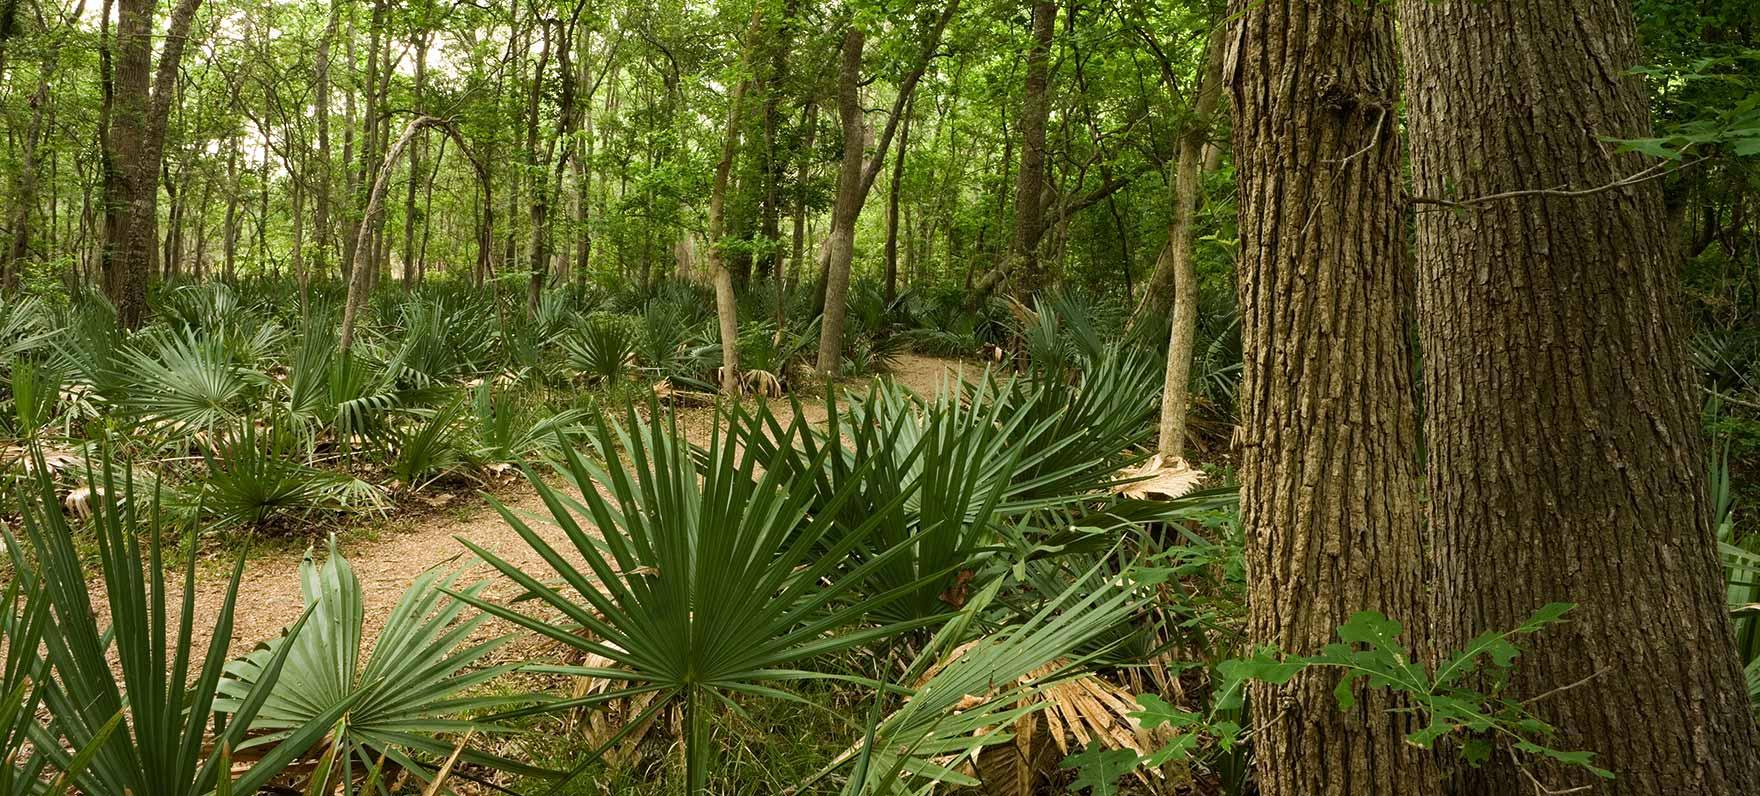 Dwarf palmettos and other beautiful tropical vegetation make this a botanical wonderland.